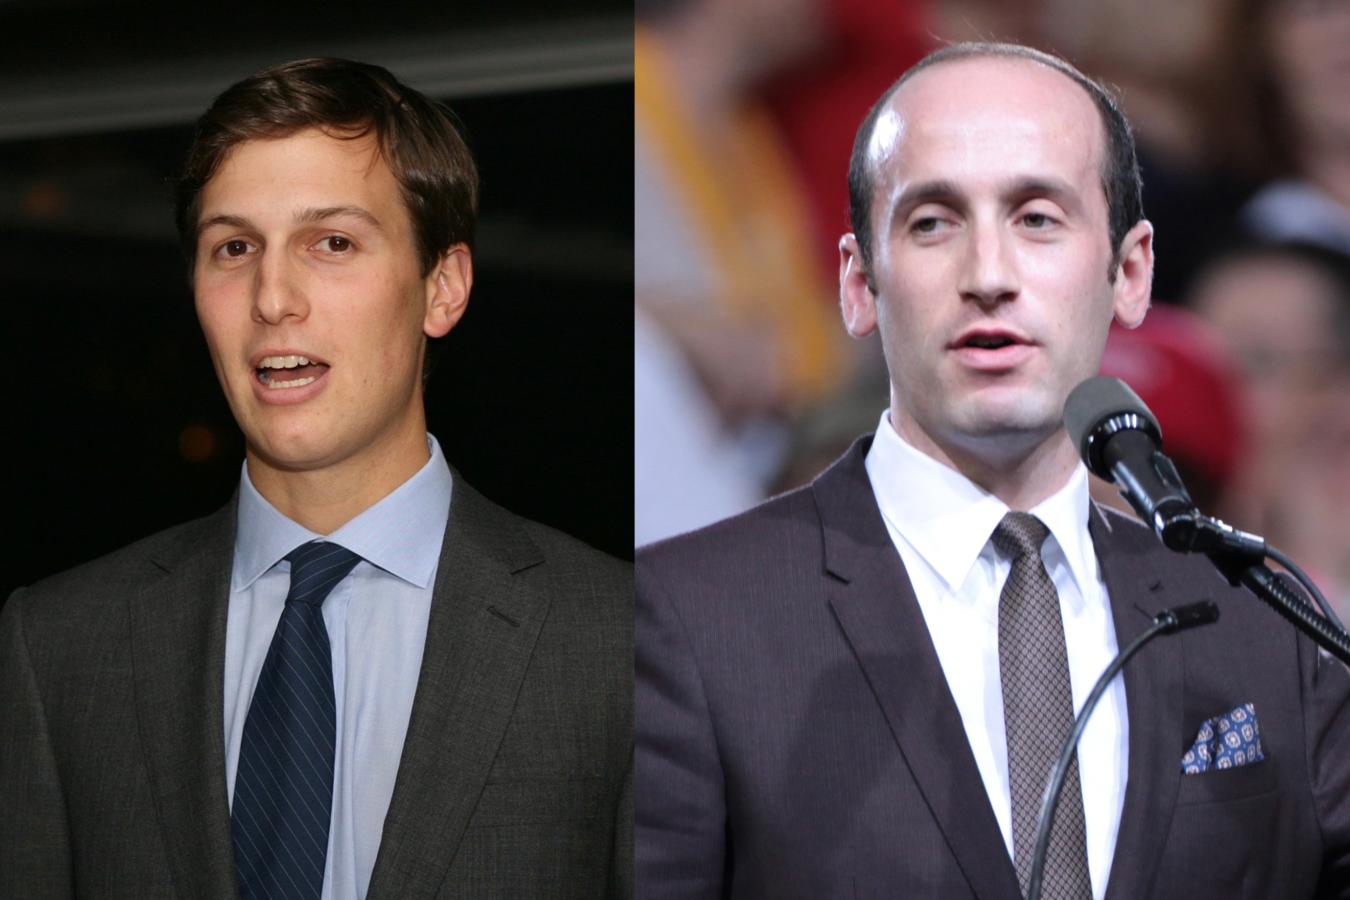 Trump Senior Advisors: Jared Kushner and Stephen Miller, both with Jewish immigrant ancestry.